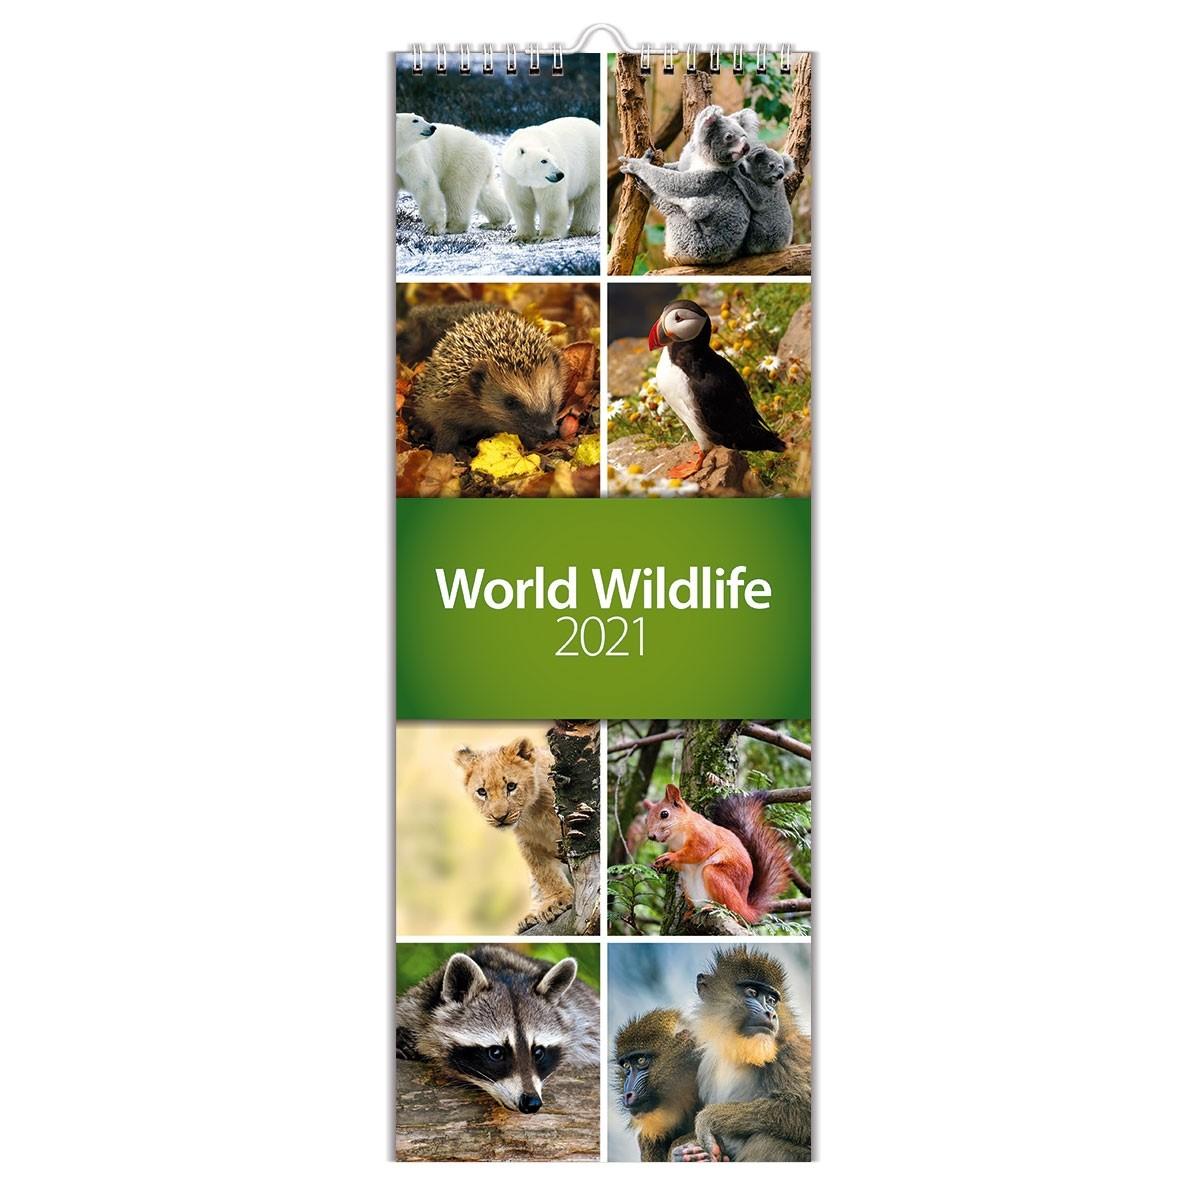 2021 World Wildlife Slim Wall Calendar